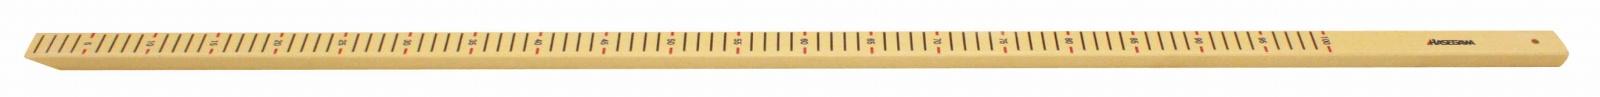 抗菌 計量棒 1,200mm KEB-120 【厨房用品 調理器具 キッチン用品 キッチン 特価 格安 新品 販売 通販】 [7-0195-0702 6-0191-0702 ]